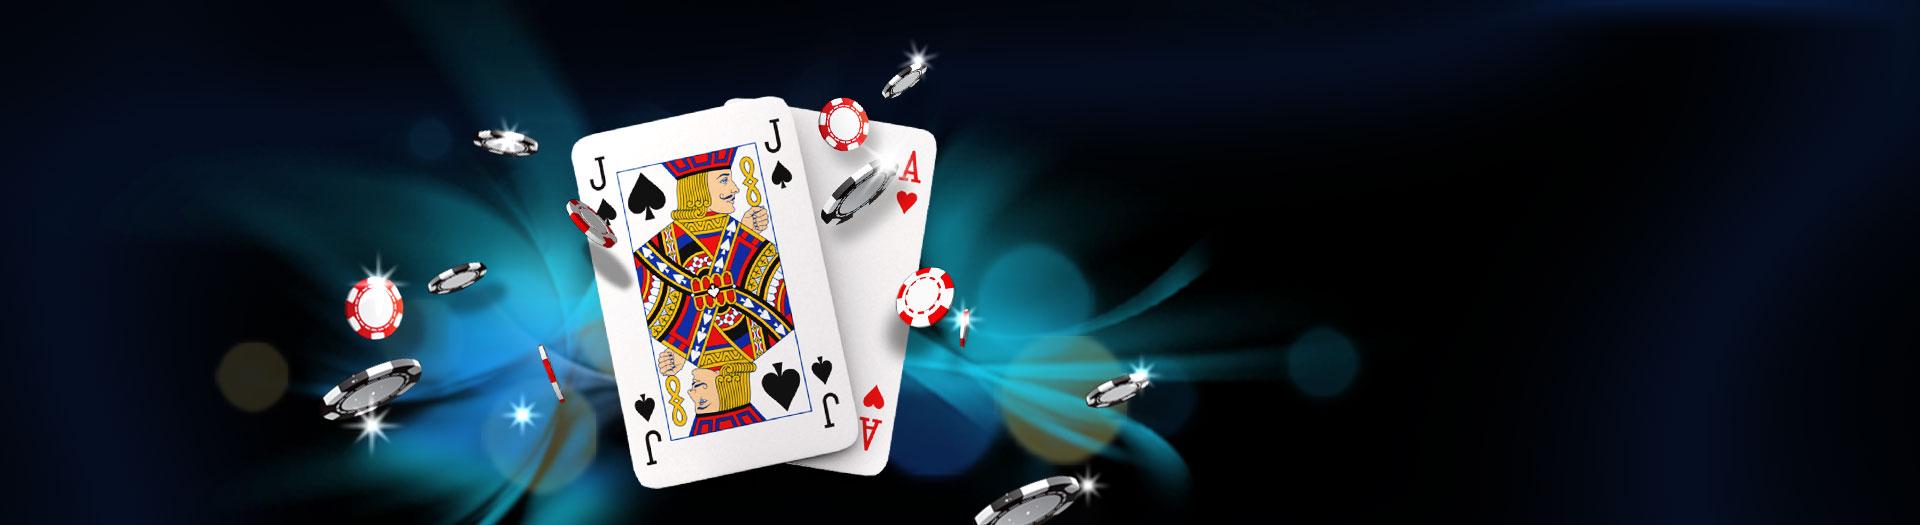 888 casino affiliates freeplay